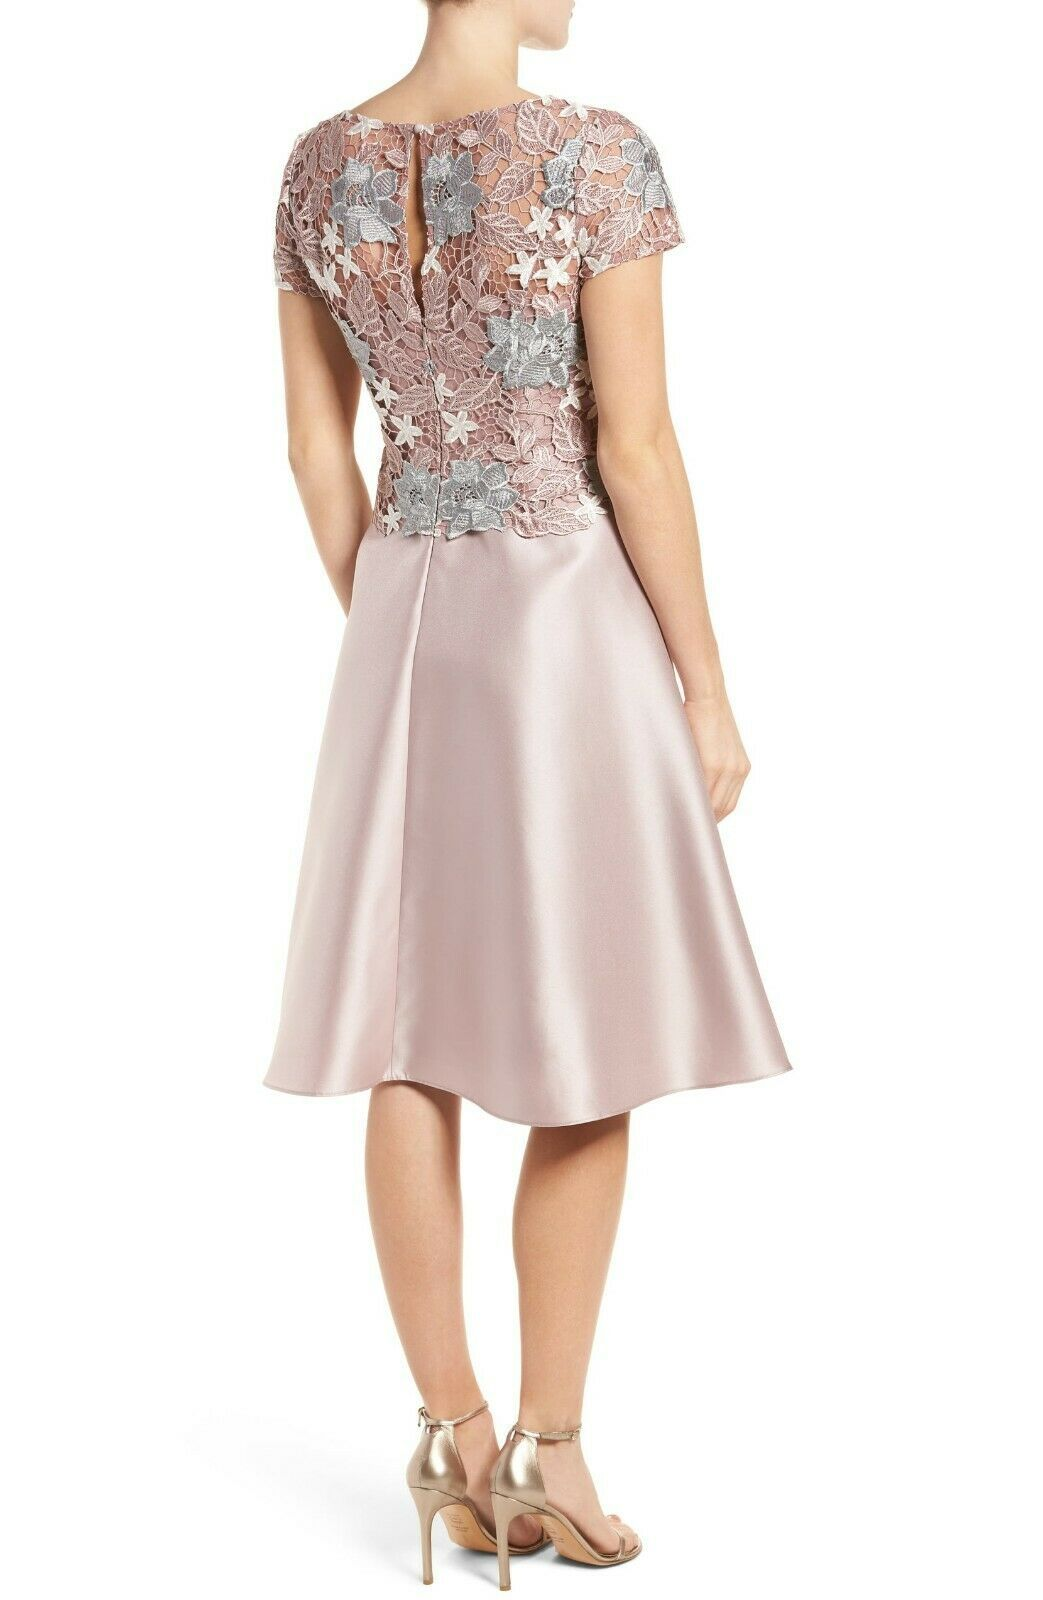 Adrianna Papell AP1E201246 Guipure Lace & Mikado Dress Sz 14